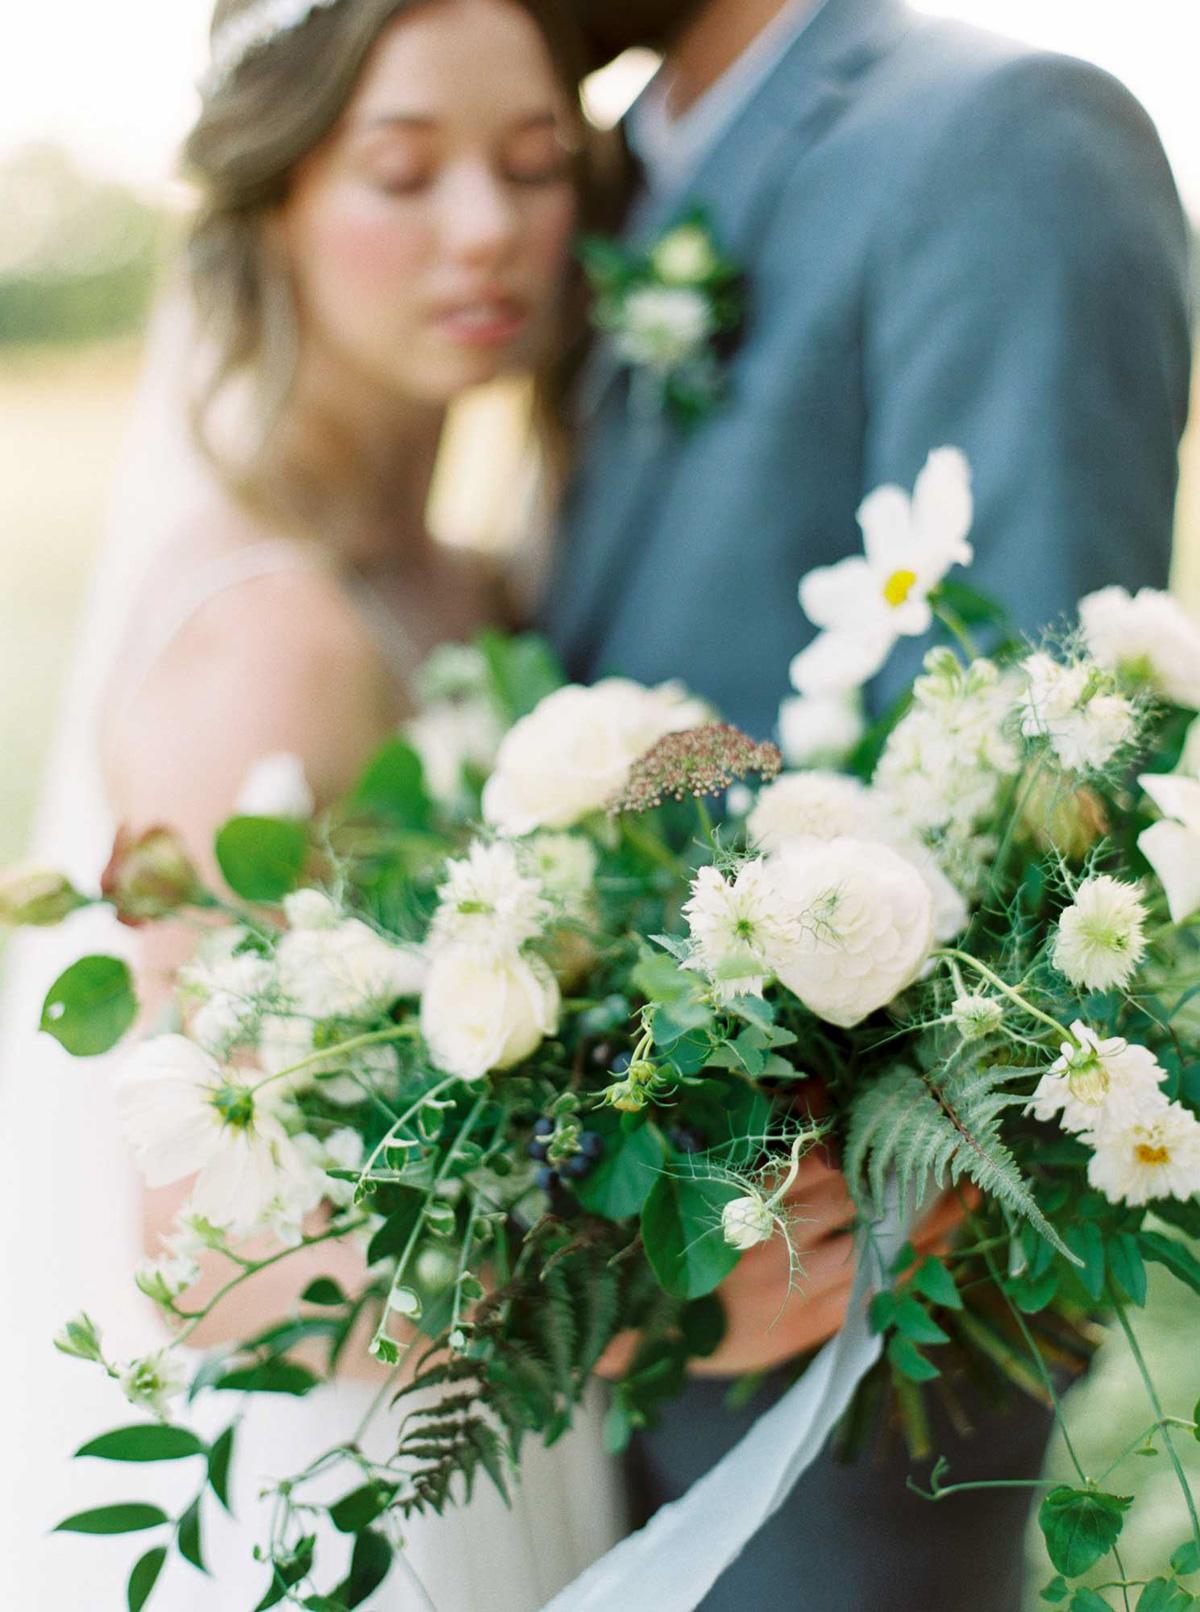 kayla-yestal-vineyard-bride-swish-list-woodland-weddings-niagara-wedding-editorial-50.jpg